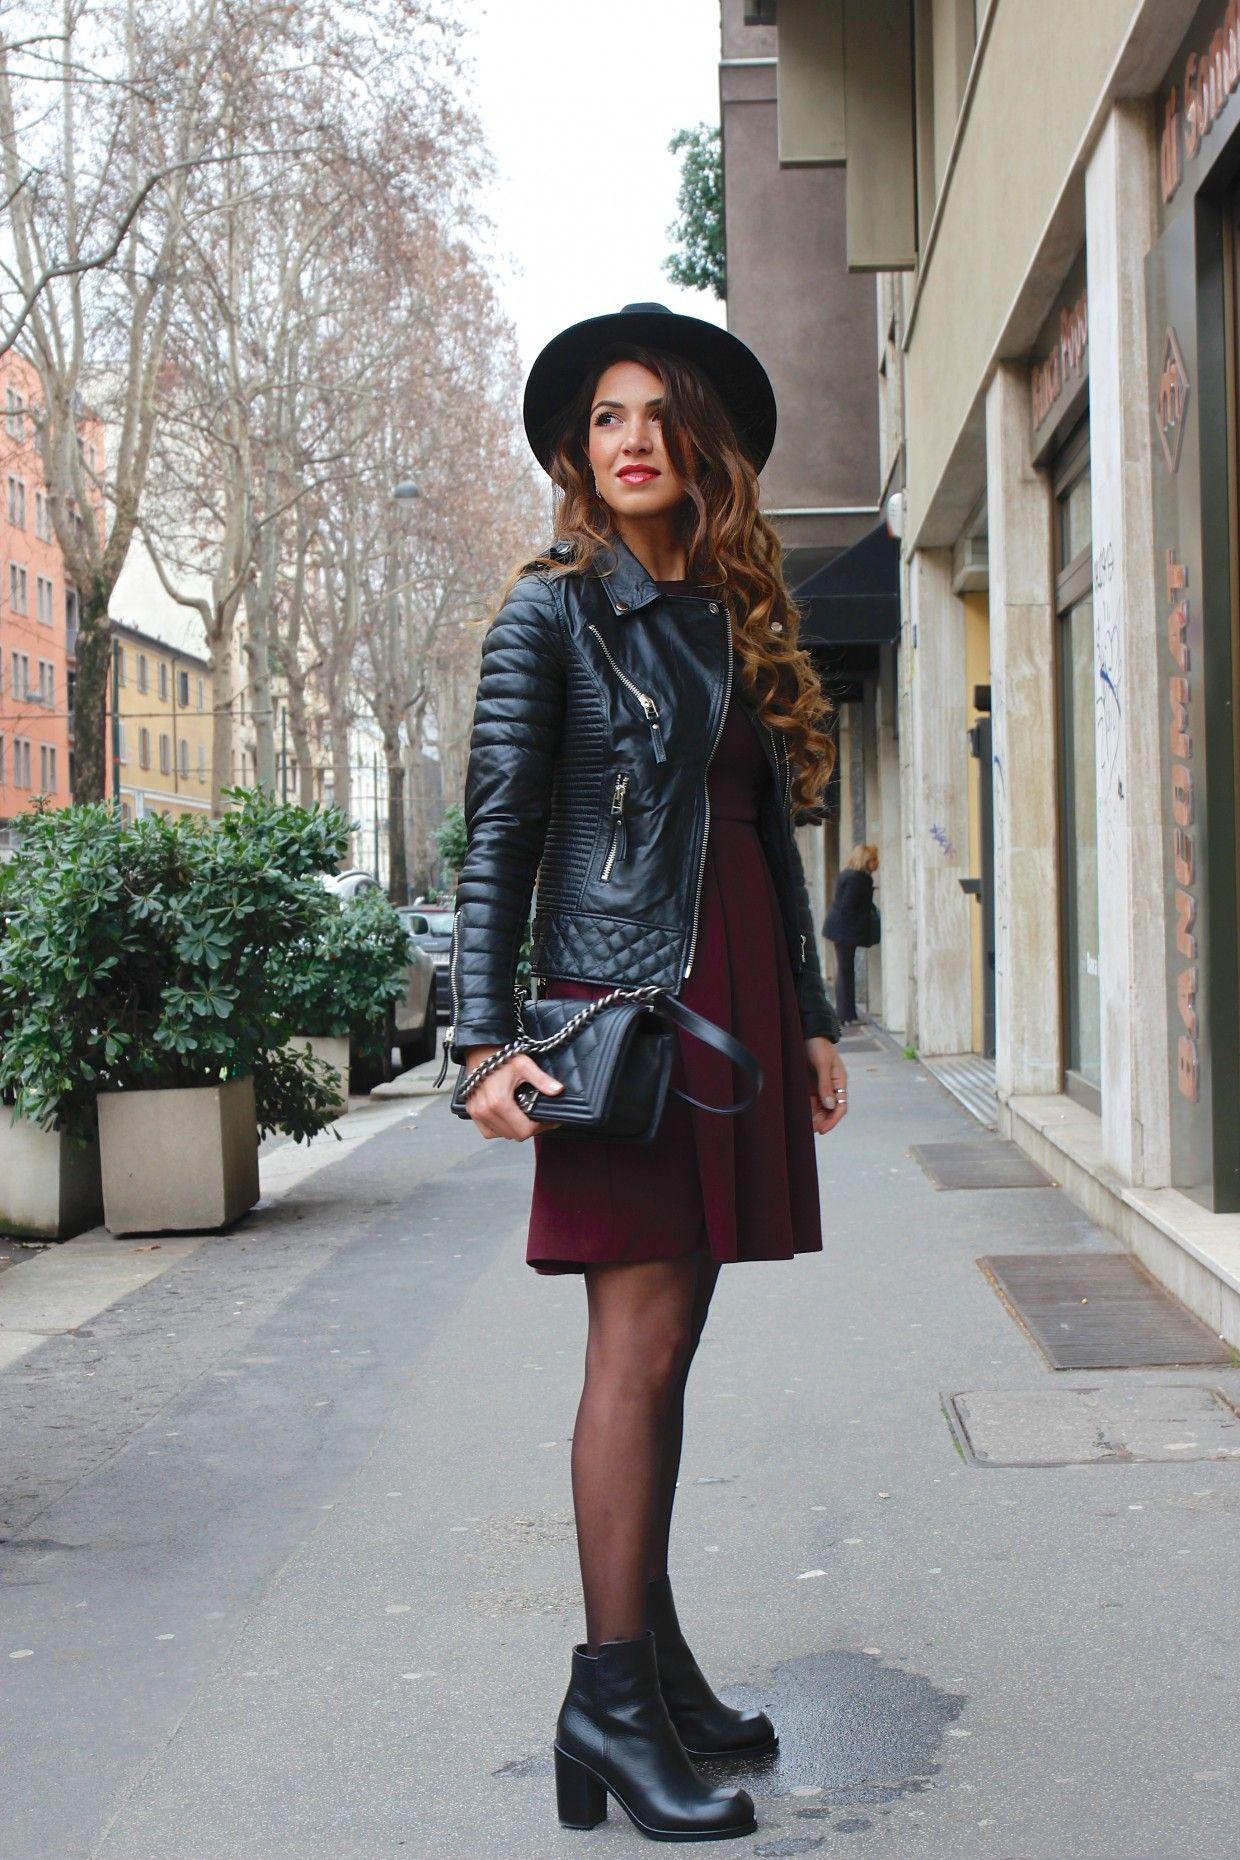 Milan Day 2: Aubergine and Leather | Negin Mirsalehi